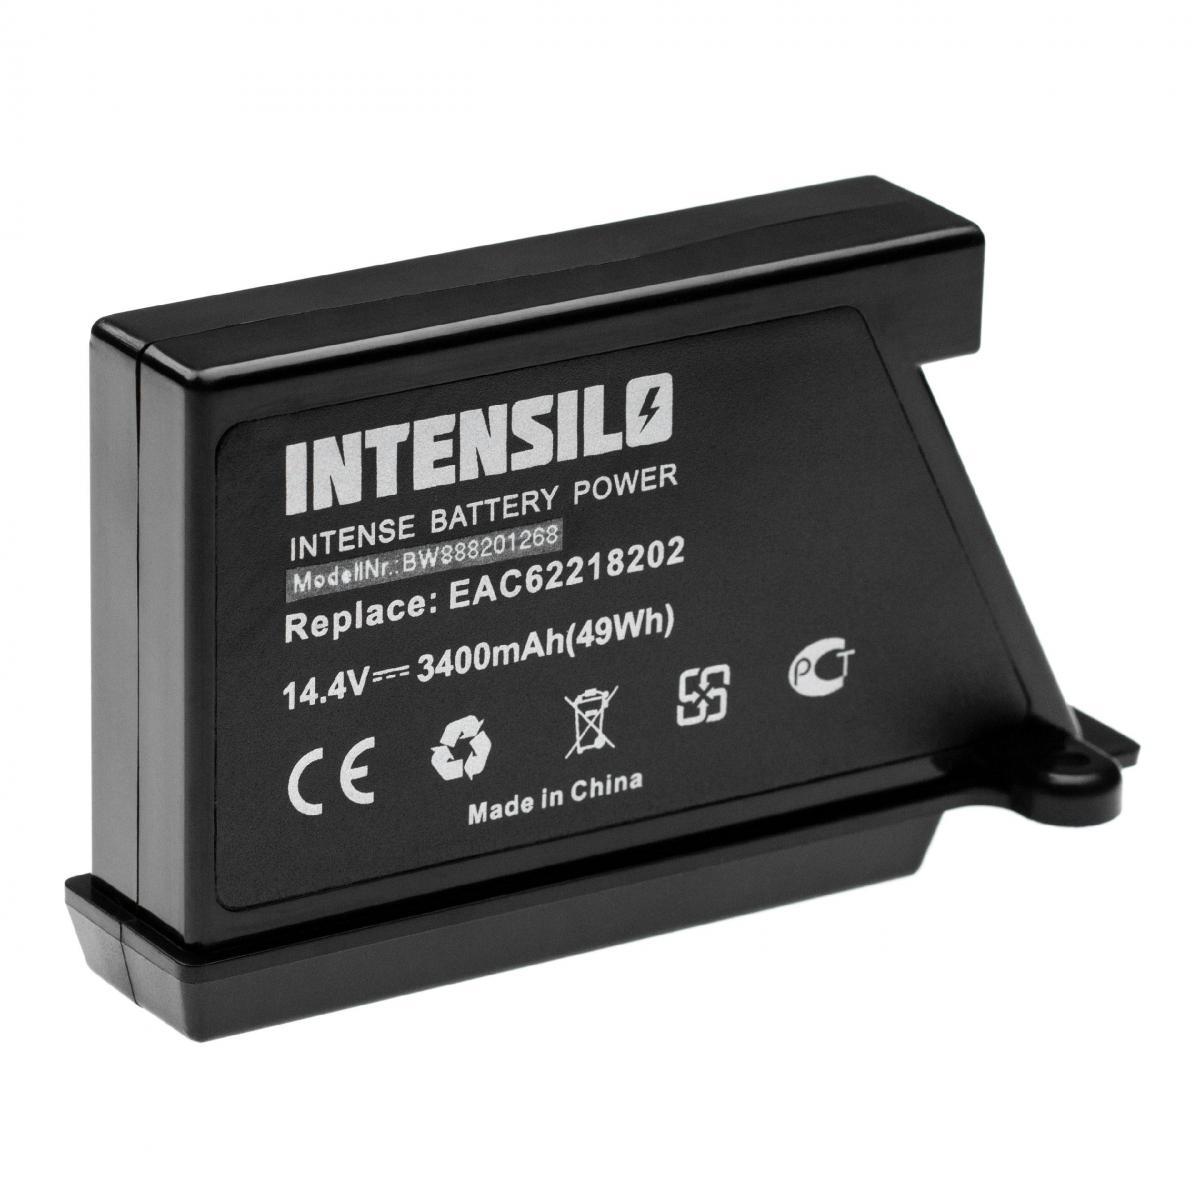 Vhbw INTENSILO Batterie compatible avec LG HOM-BOT VR64703LVMB, VR65502LV, VR6560LV robot électroménager (3400mAh, 14,4V, Li-